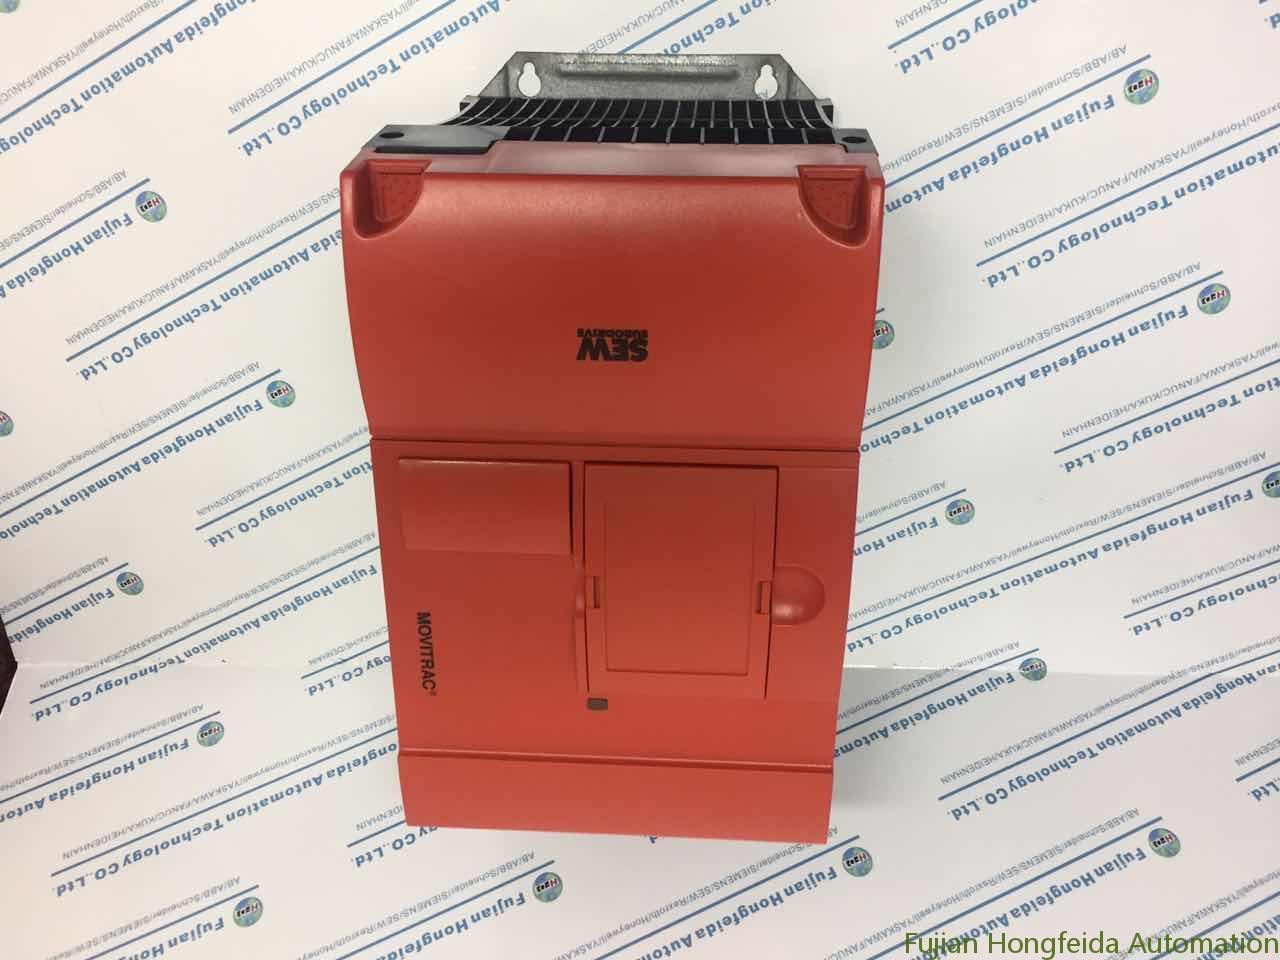 SEWMC07B0075-5A3-4-00